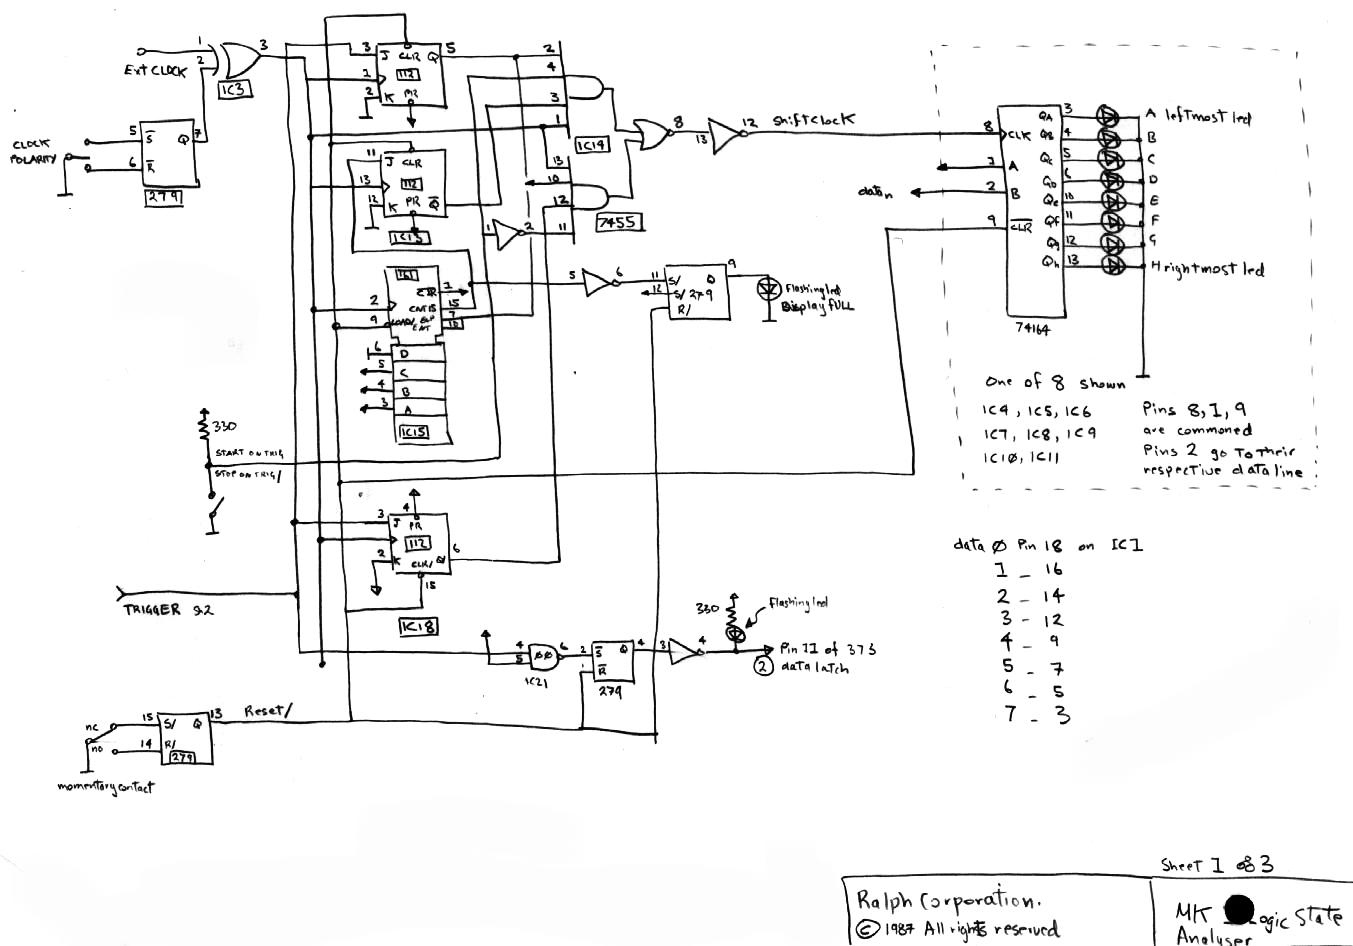 Lsa Shift Registers 74ls164 The Display Controller